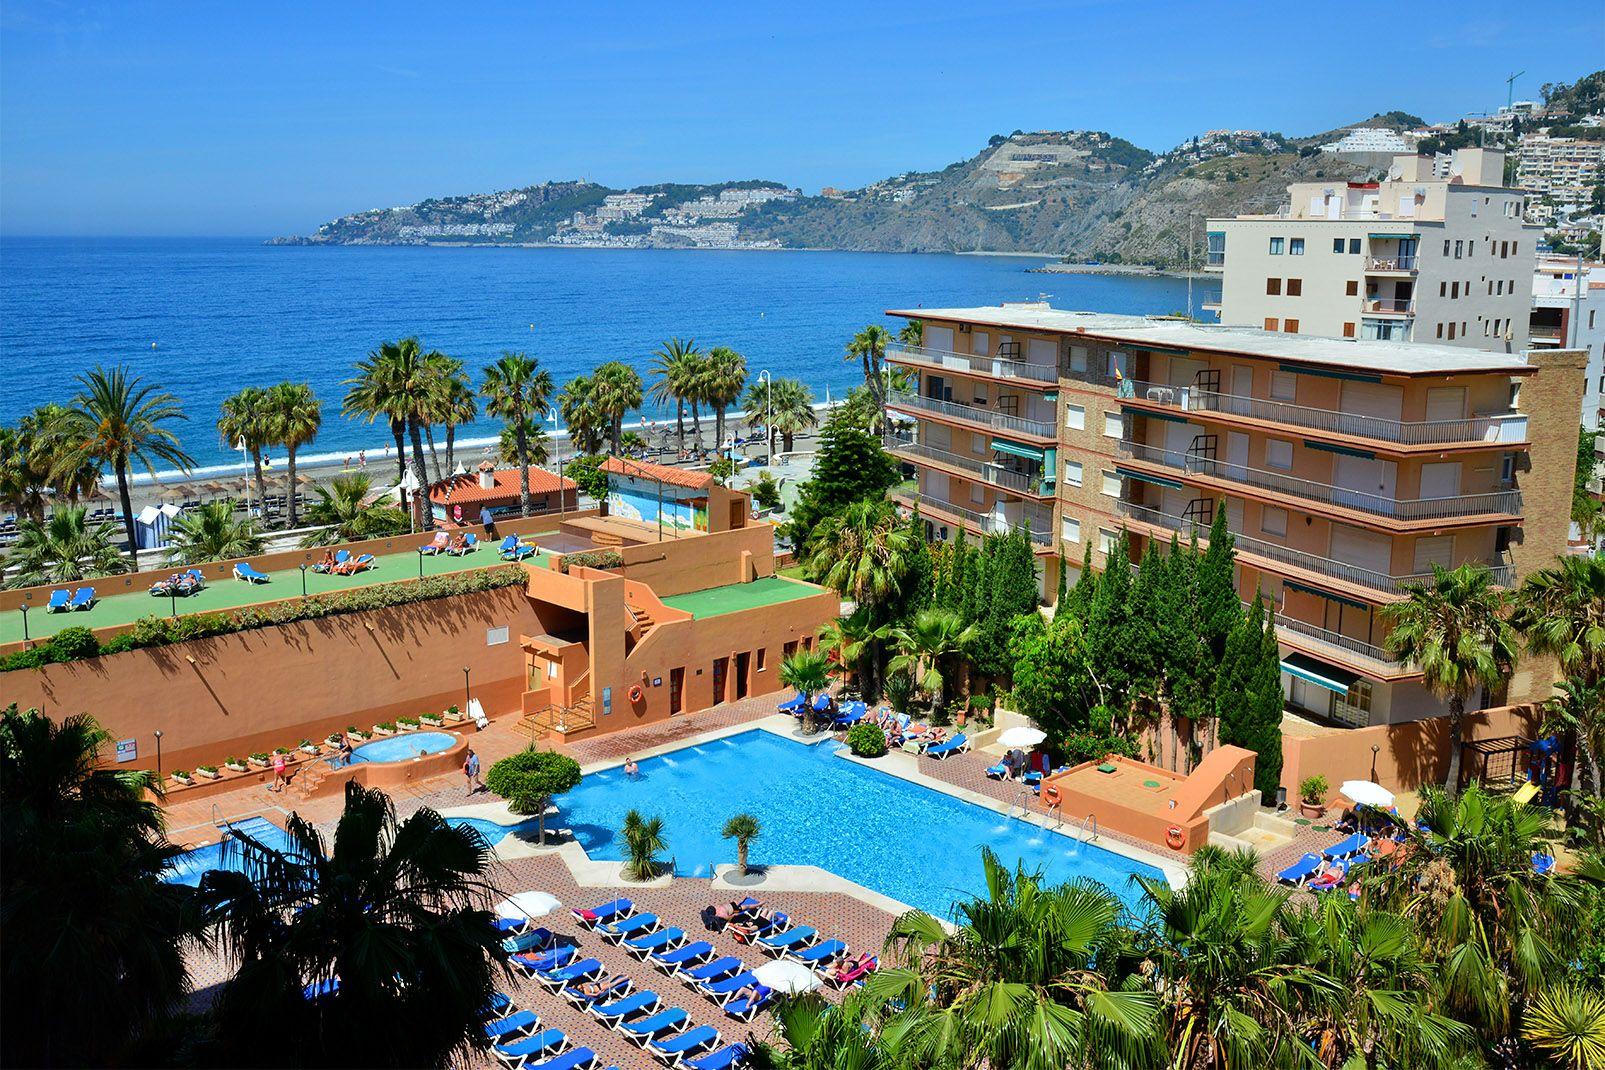 Carte Espagne Andalousie Almunecar.Sejour Espagne Top Clubs Almunecar Playa 4 Malaga Region